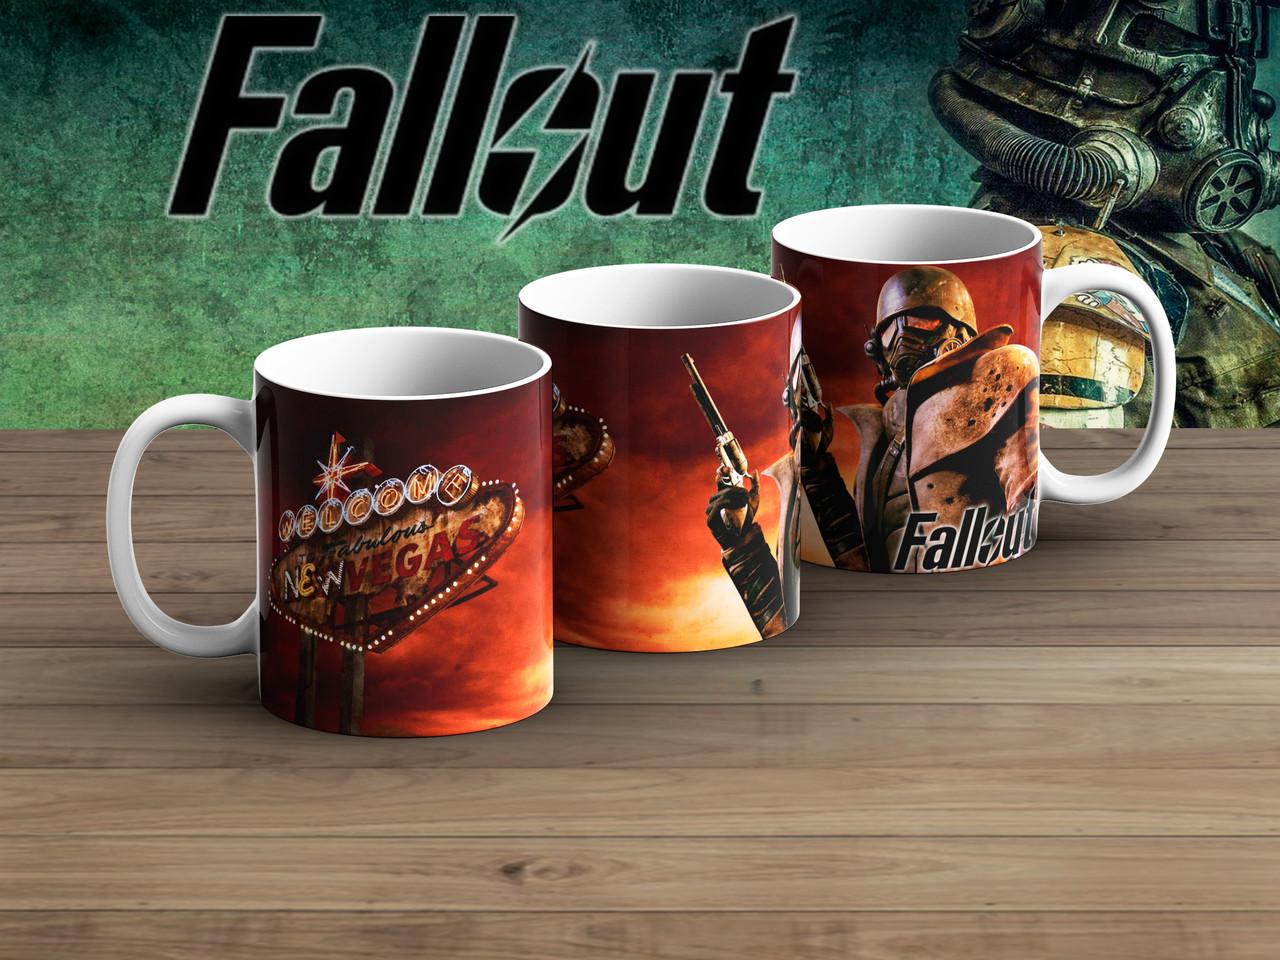 Чашка New Wegas Фаллаут / Fallout